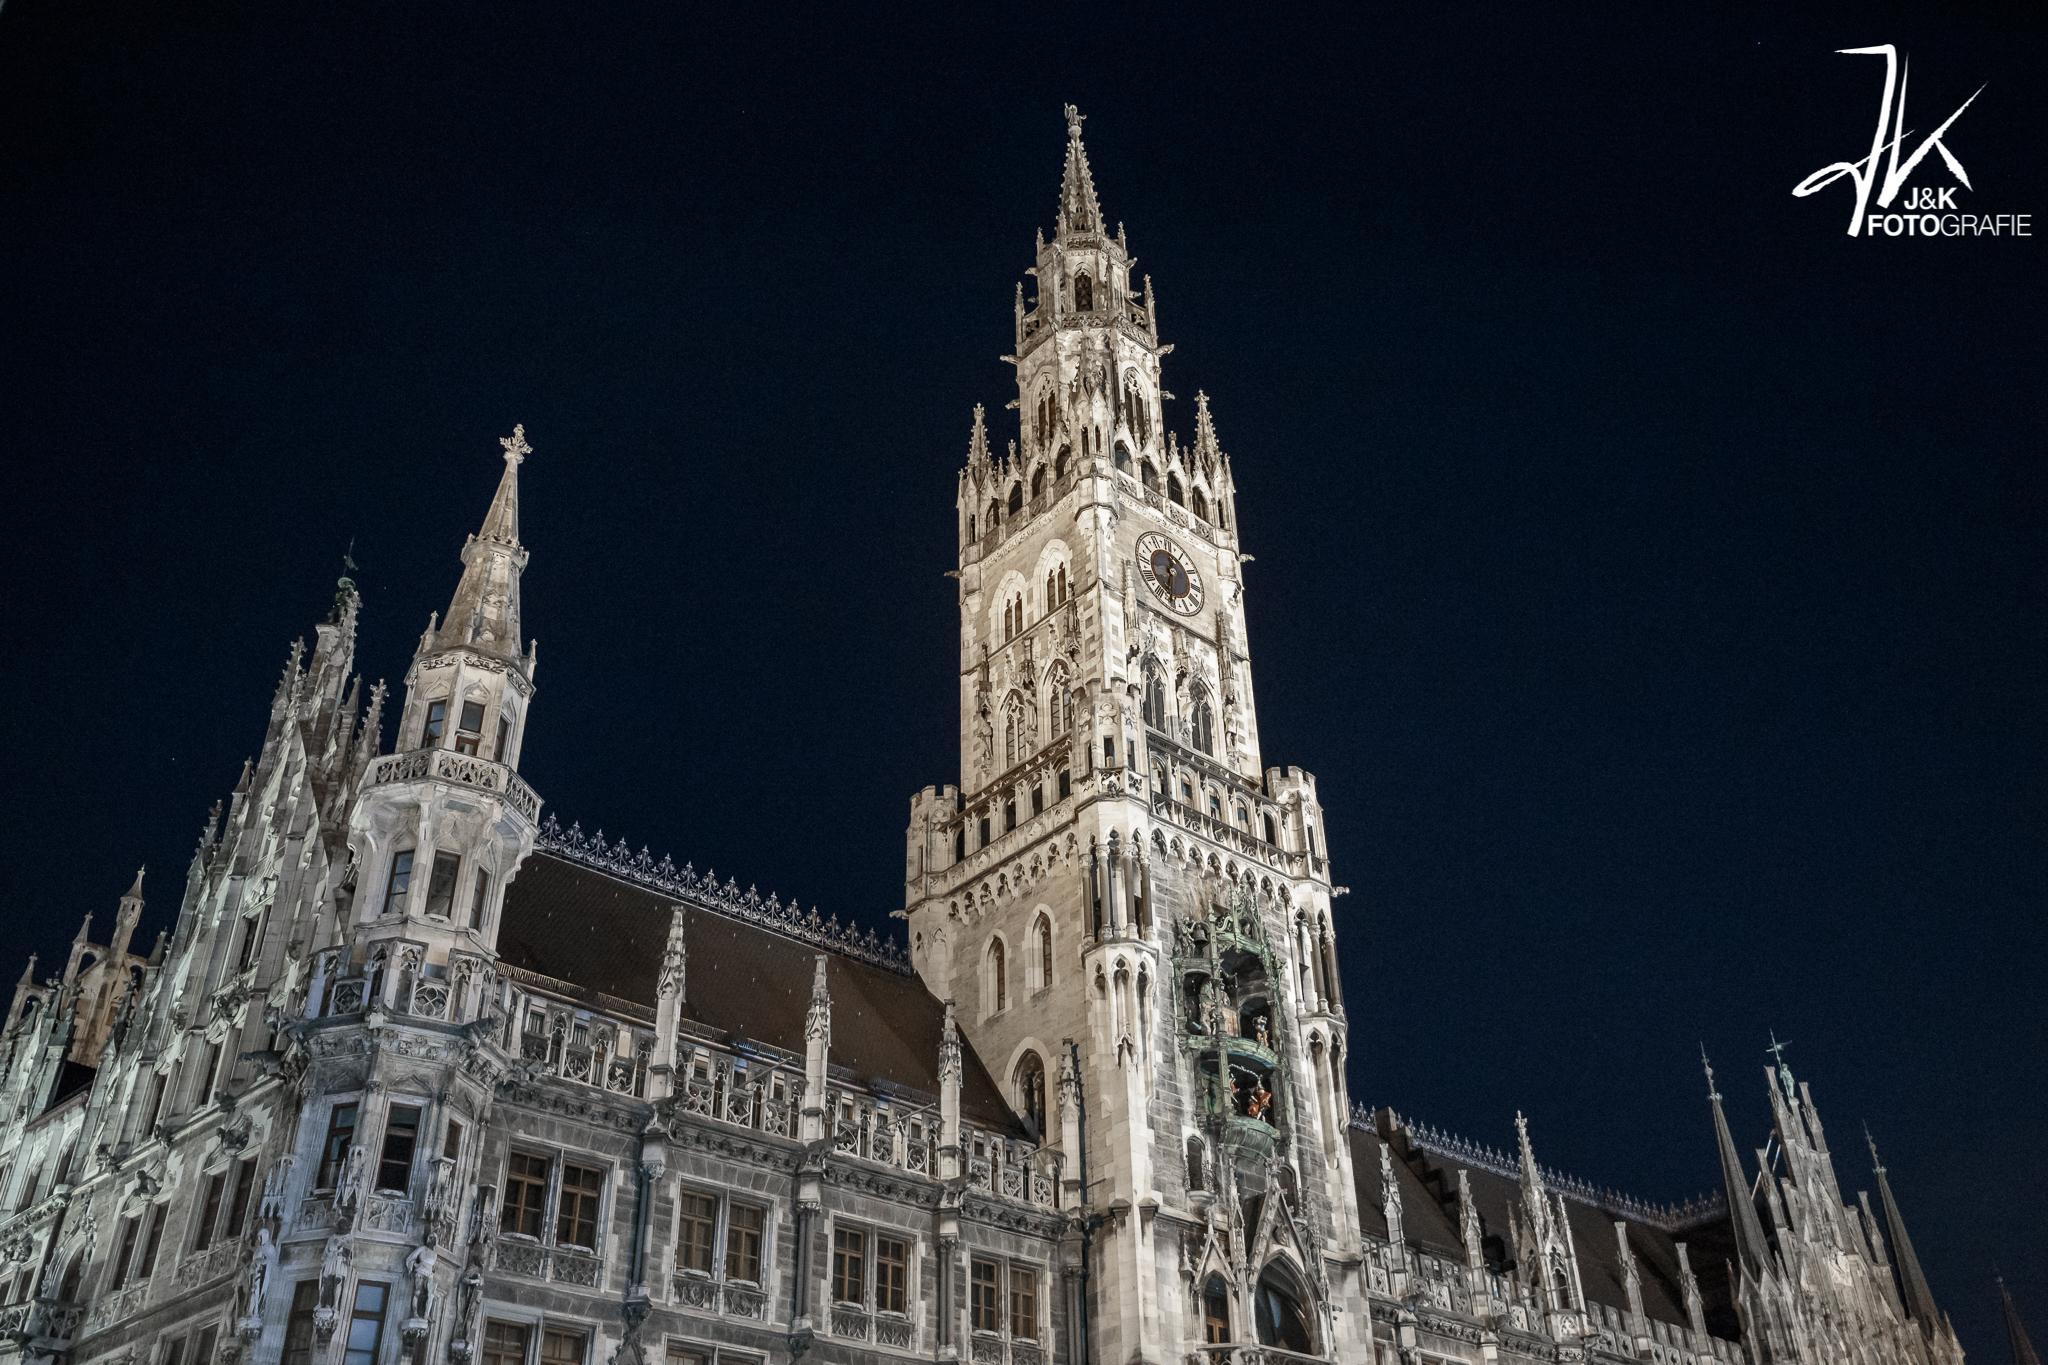 Rathaus bei Nacht, Germany